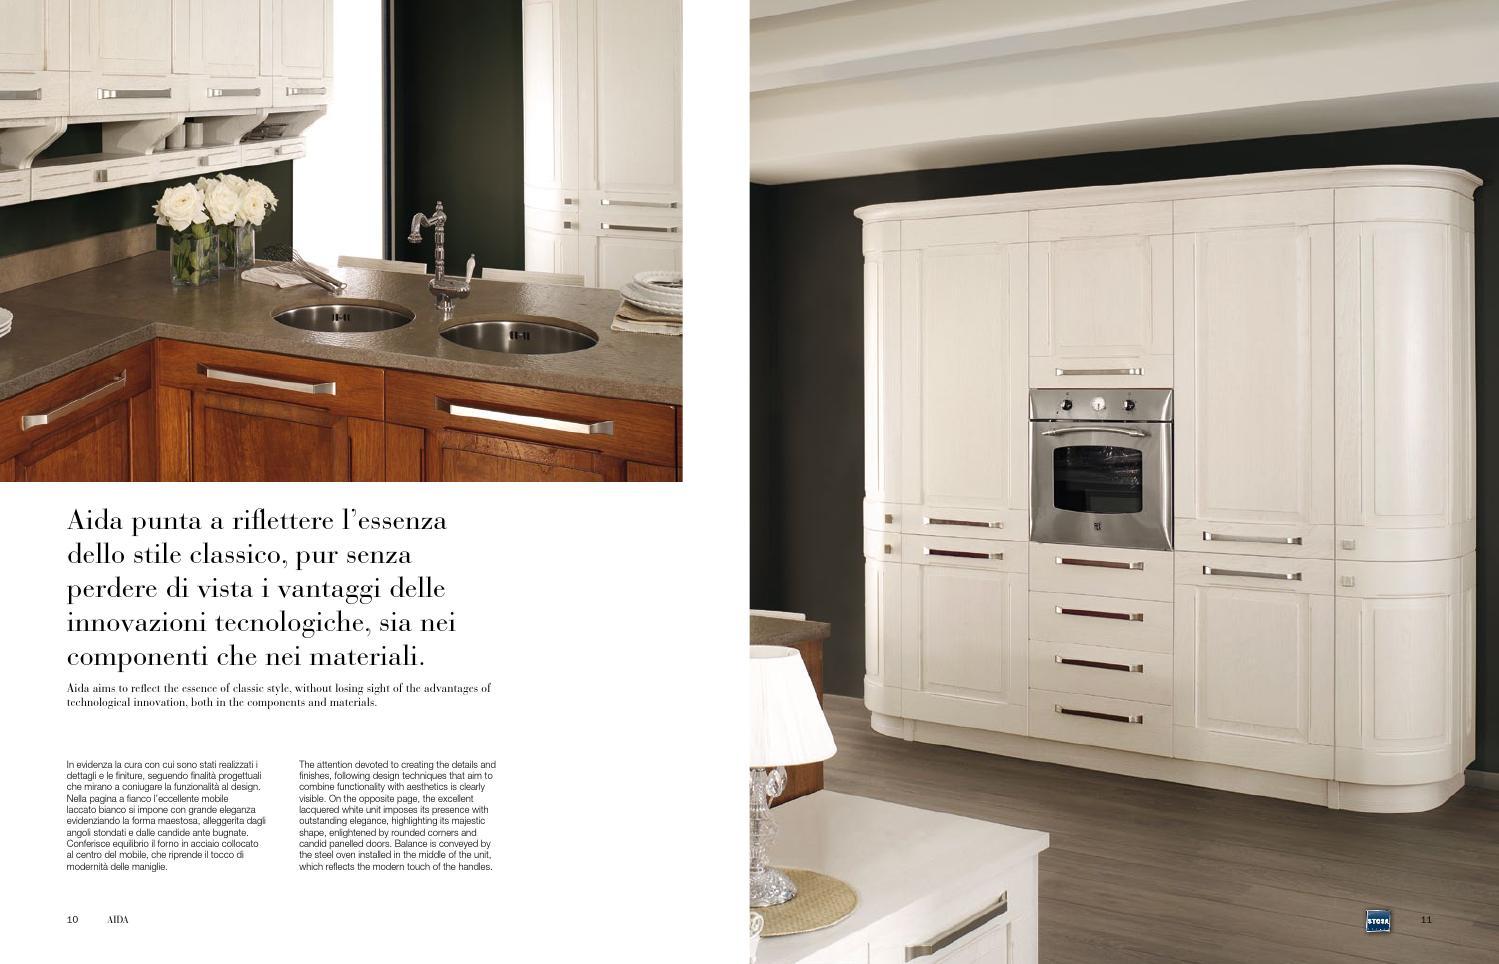 Catalogo cucine classiche stosa aida by STOSA Cucine - issuu